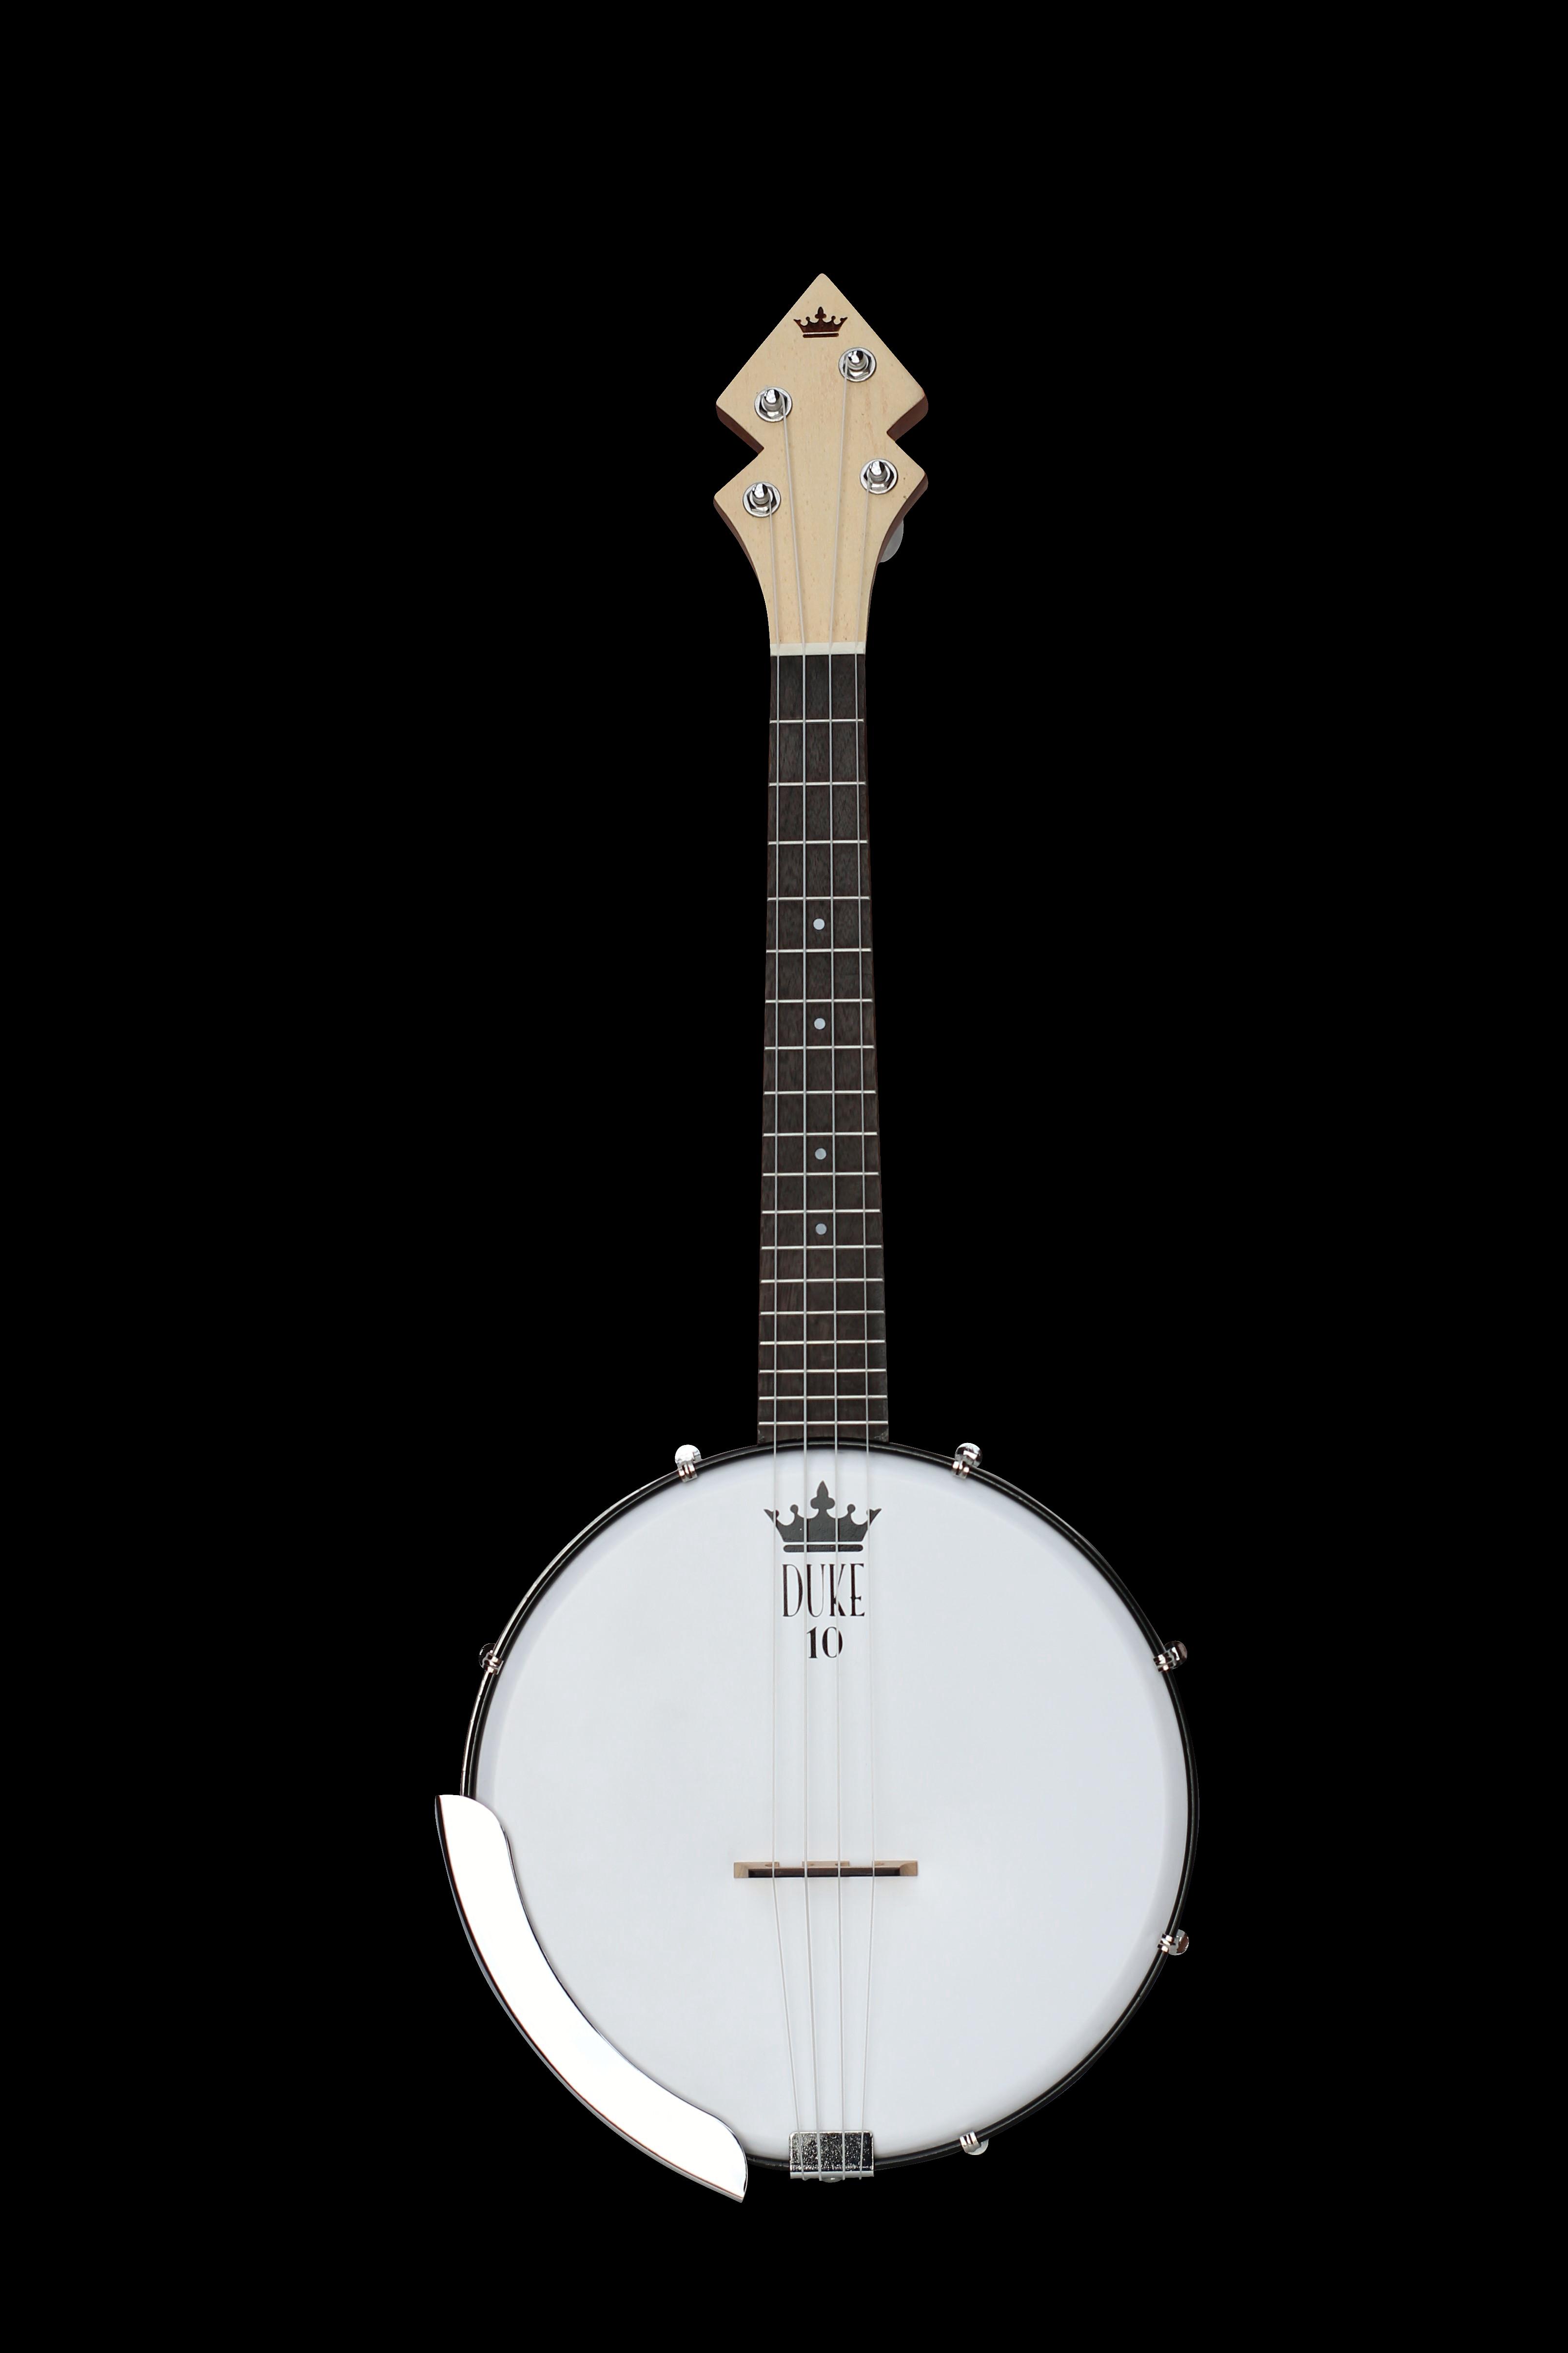 5Pc Large Finger Picks for Banjo Ukulele Guitar  FREE SHIPPING